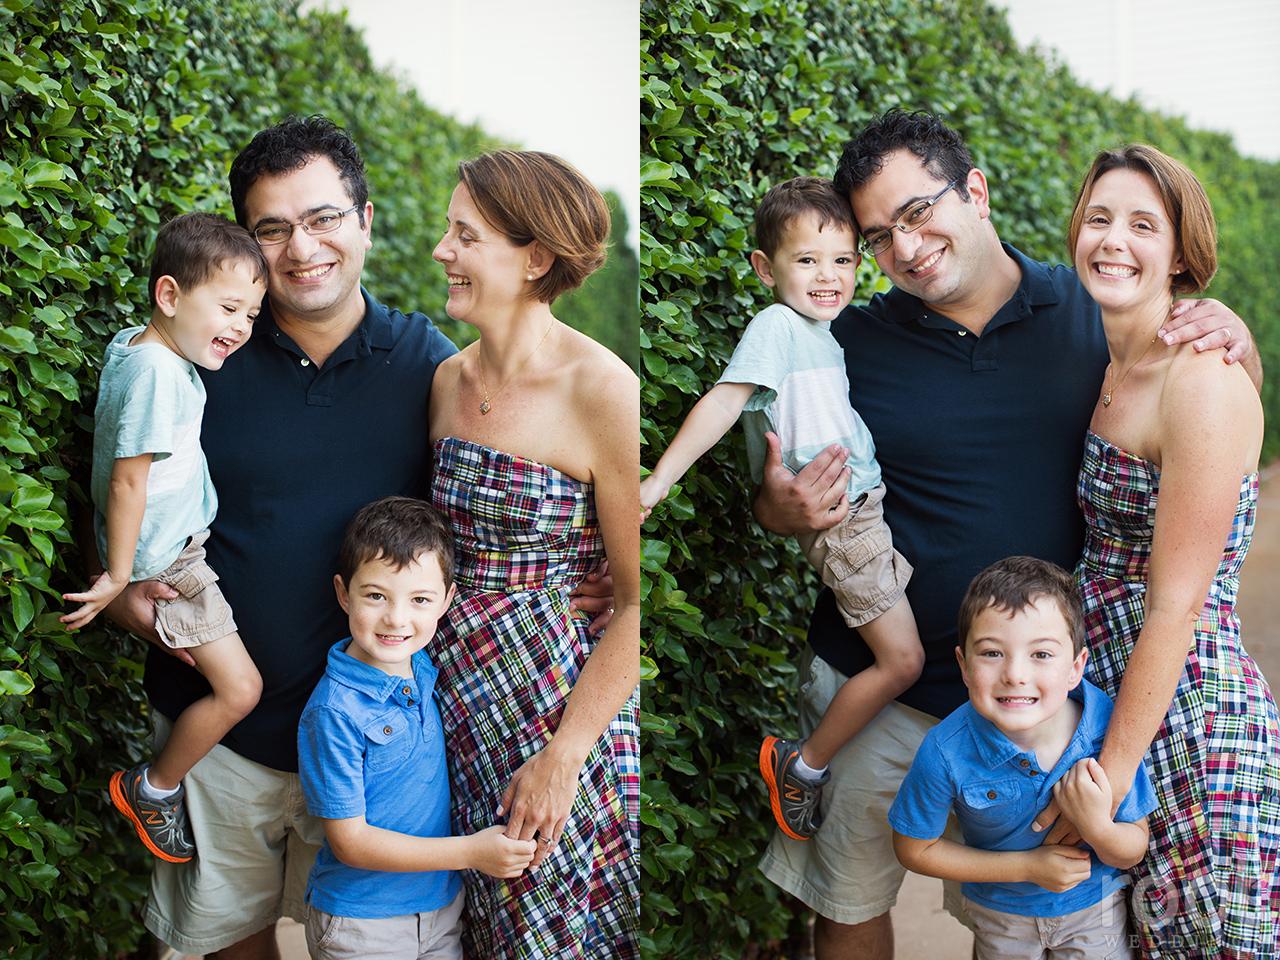 orlando-florida-family-portrait-disney-photographer-15